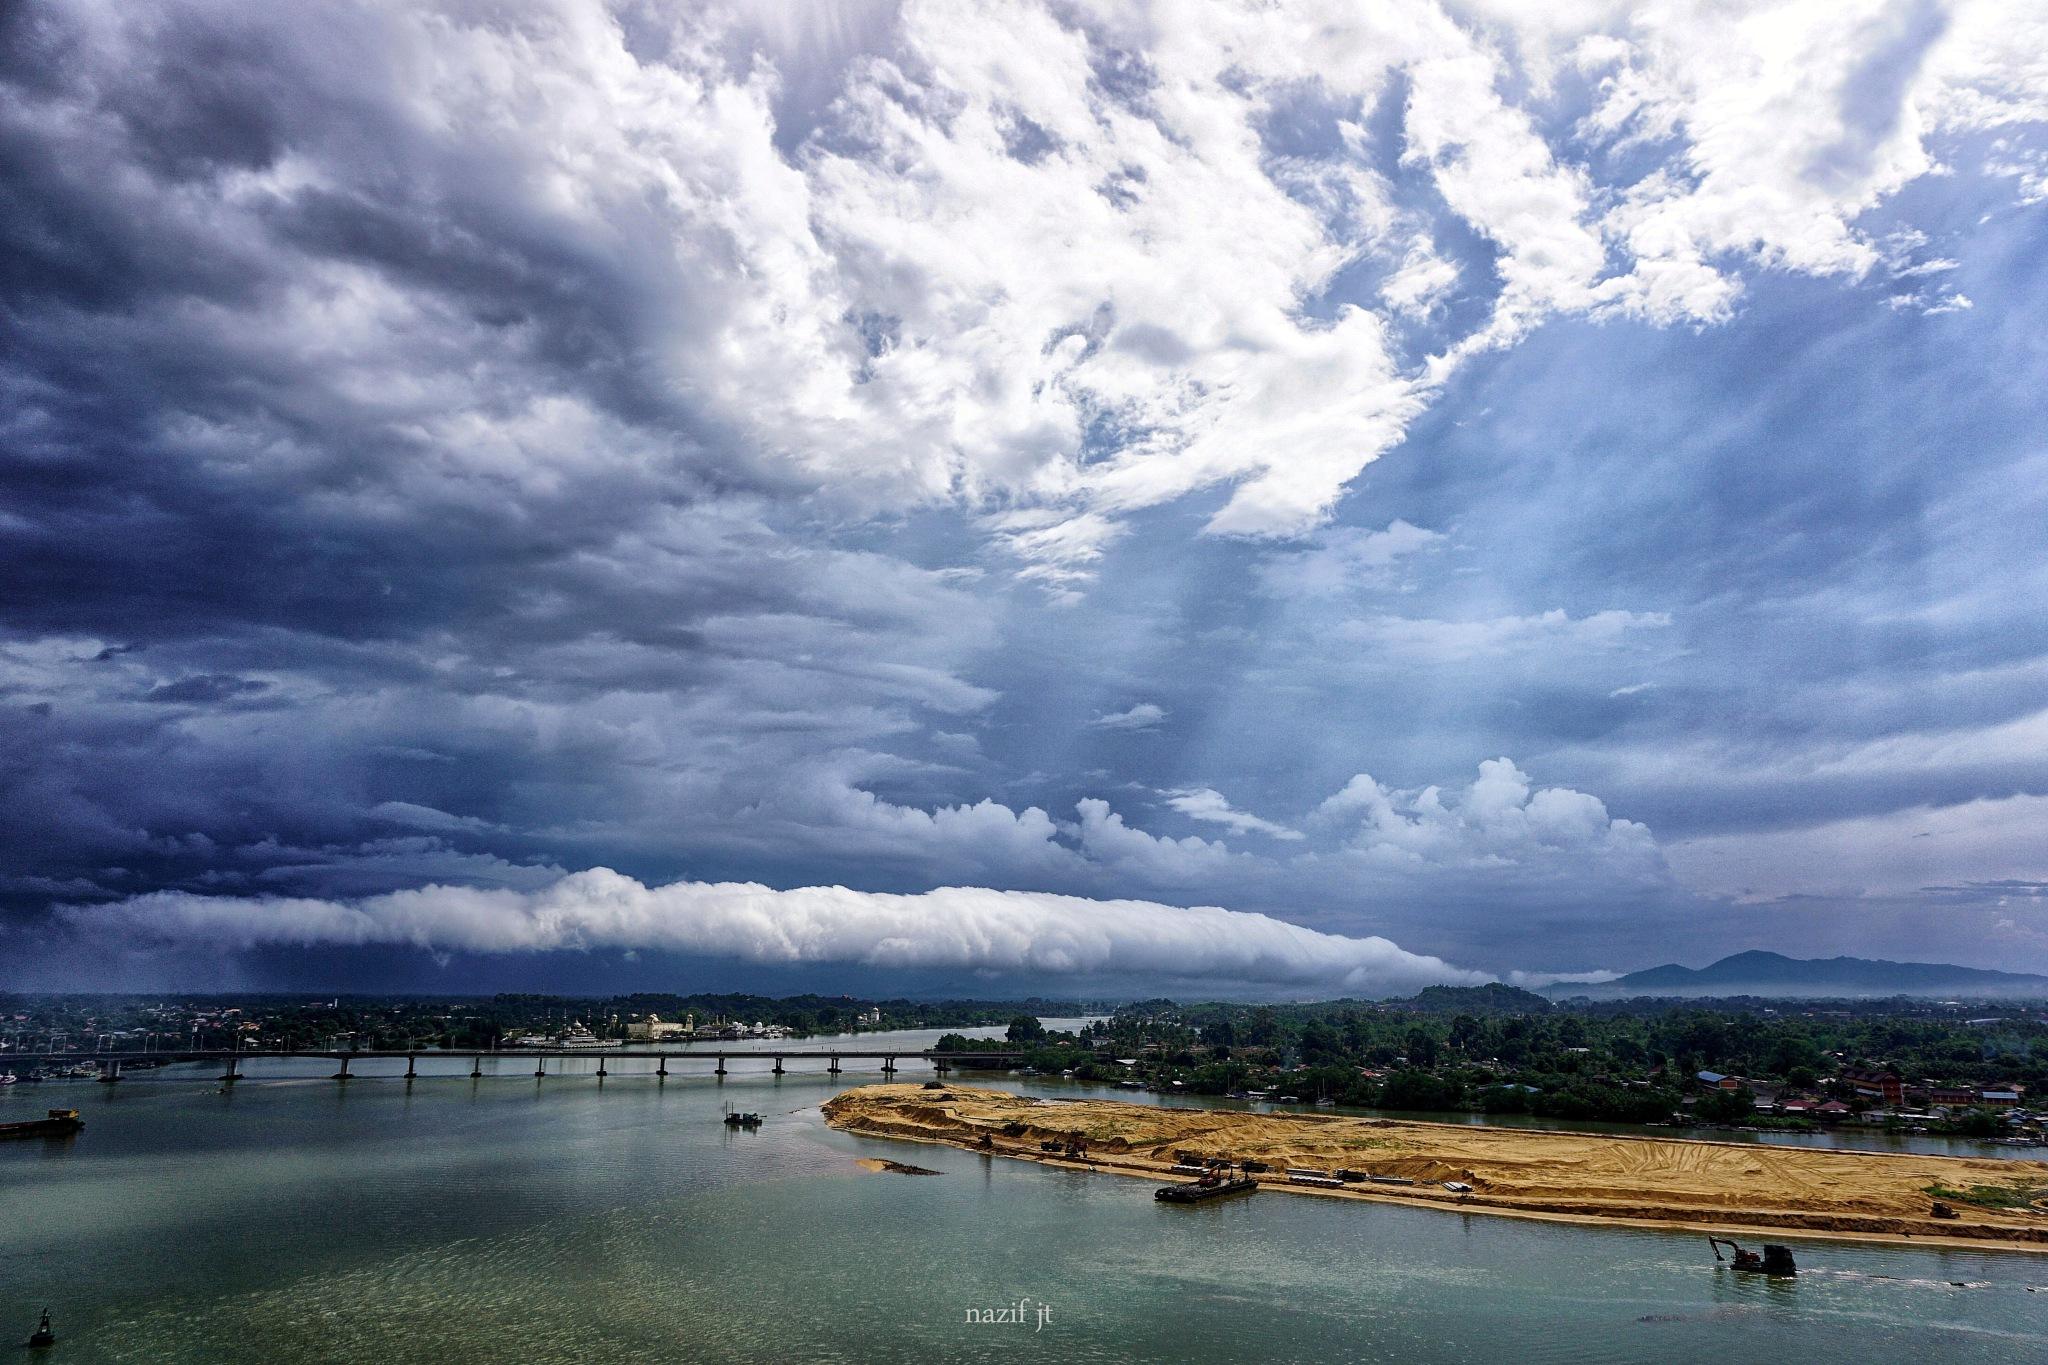 Clouds by nazifjaafar